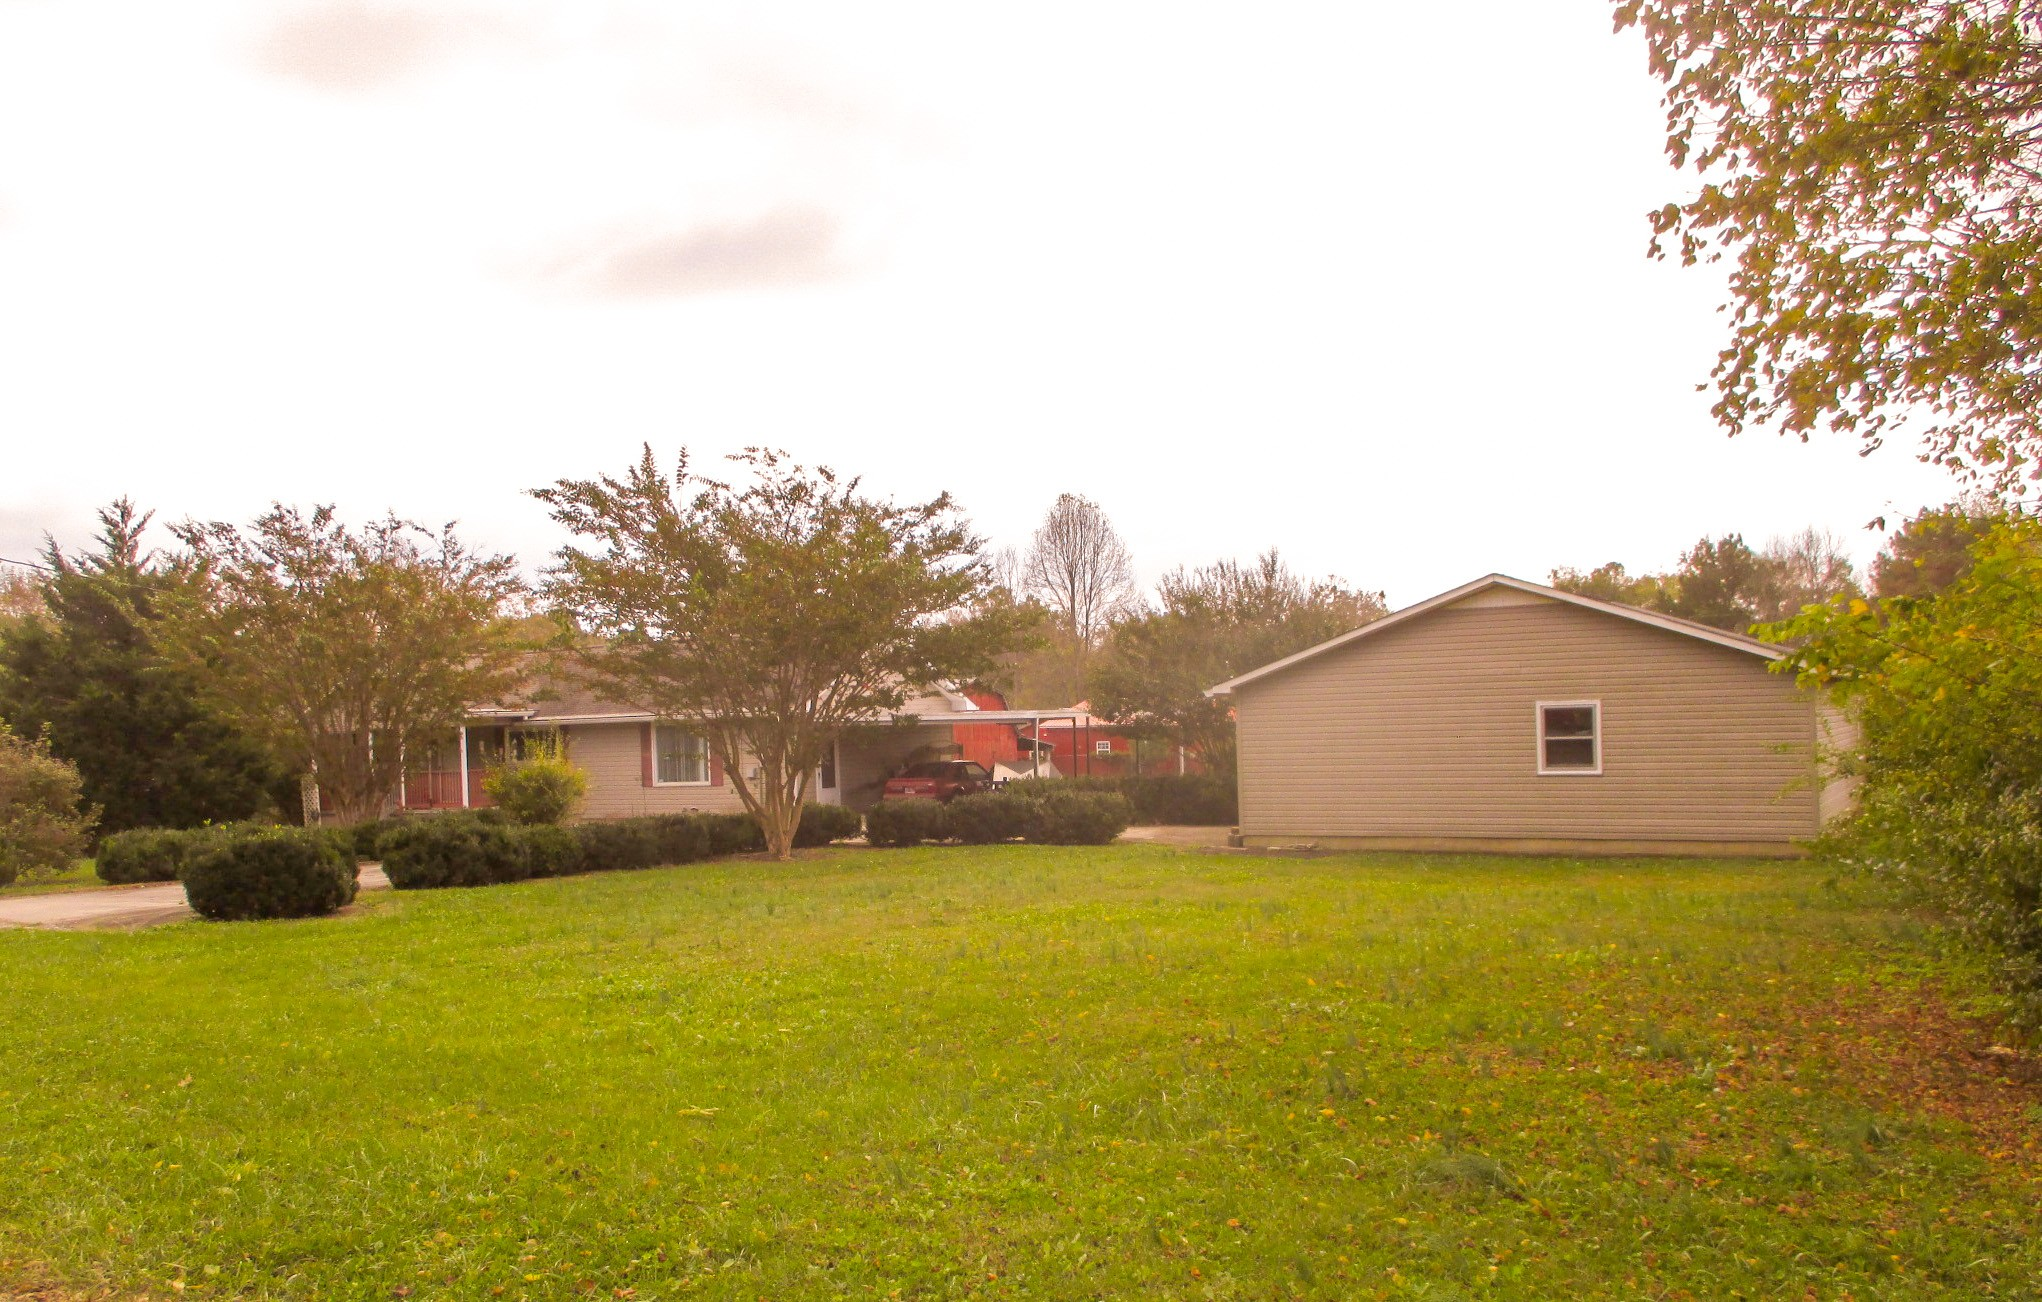 68 John Gregg Rd Property Photo - Hillsboro, TN real estate listing